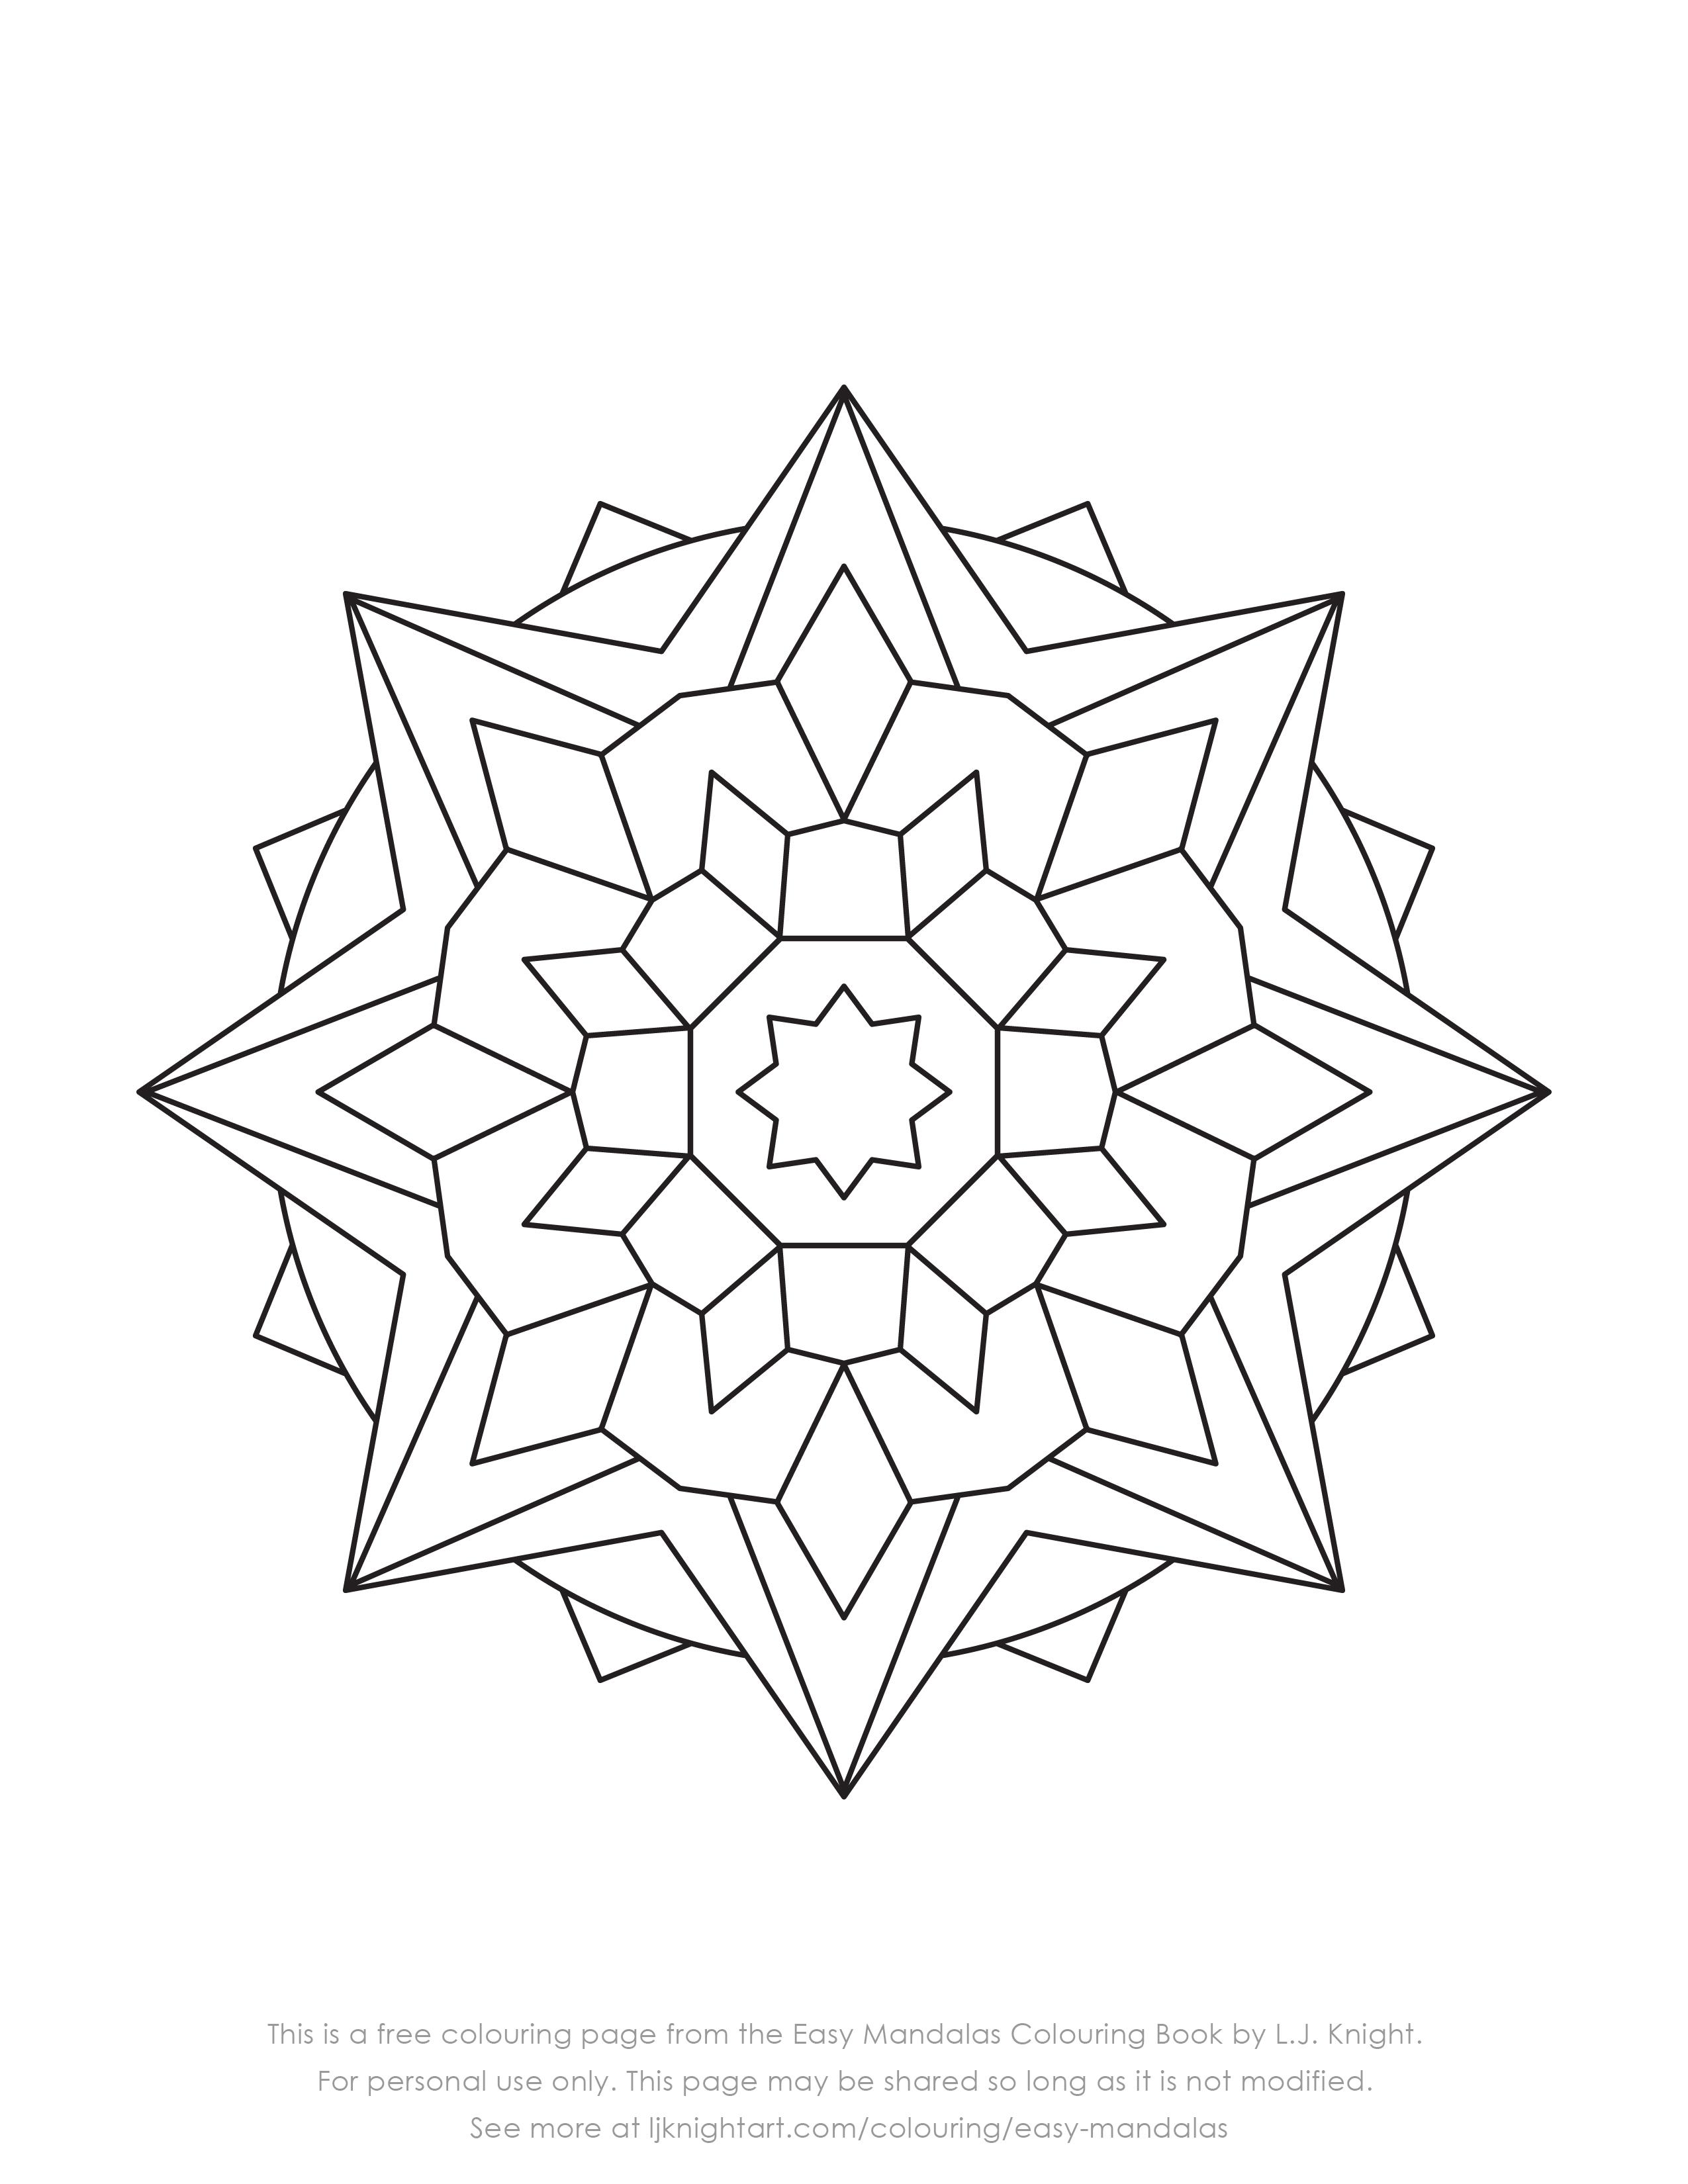 Fabulous Simple Mandala Coloring Pages – Slavyanka | 3300x2550